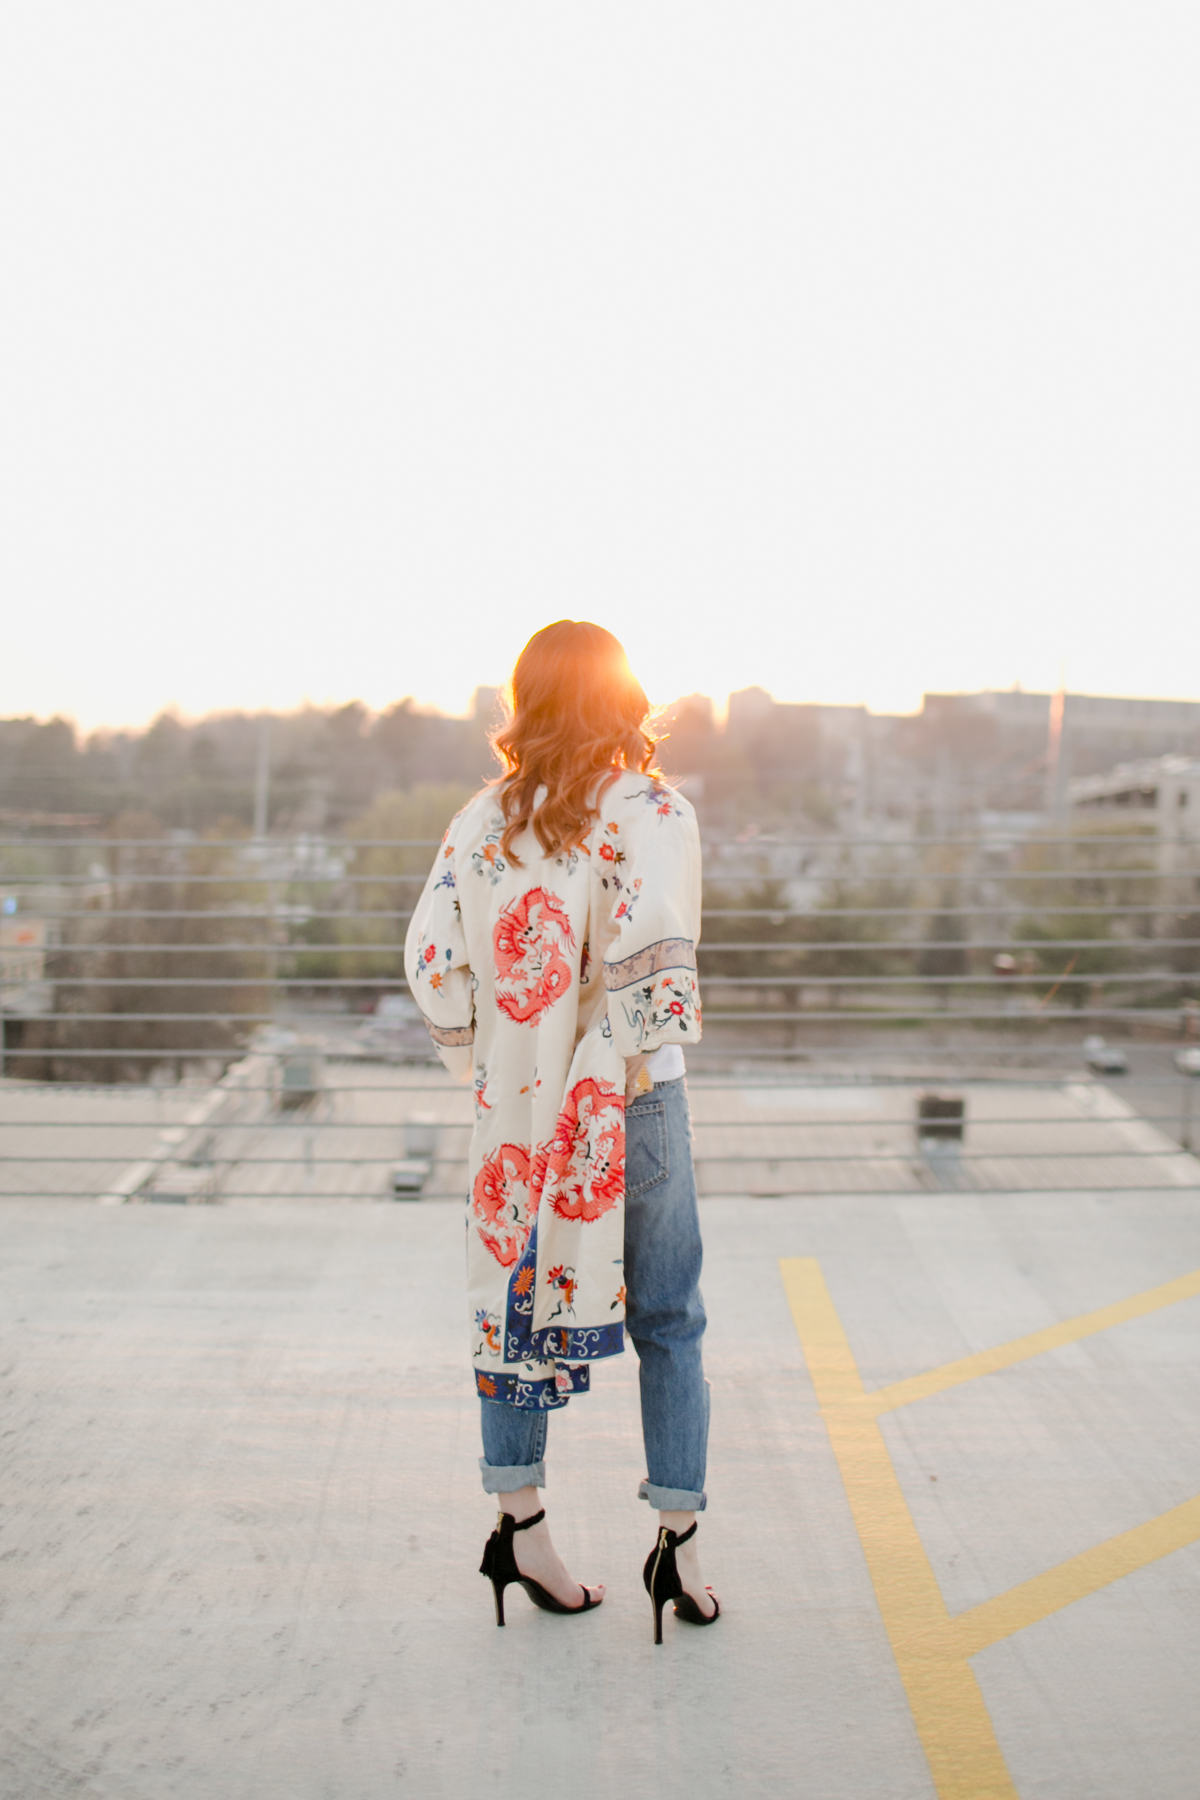 Eldridge_Edit_Anna_E_Cottrell_Tulip_Louise_Fashion_Blogger_Kimono_Deconstructed_Oversized_Boyfriend_Jean_Denim_Mother-White_T-shirt_Tom_Ford_Glasses_Joie_Heel_5.jpg